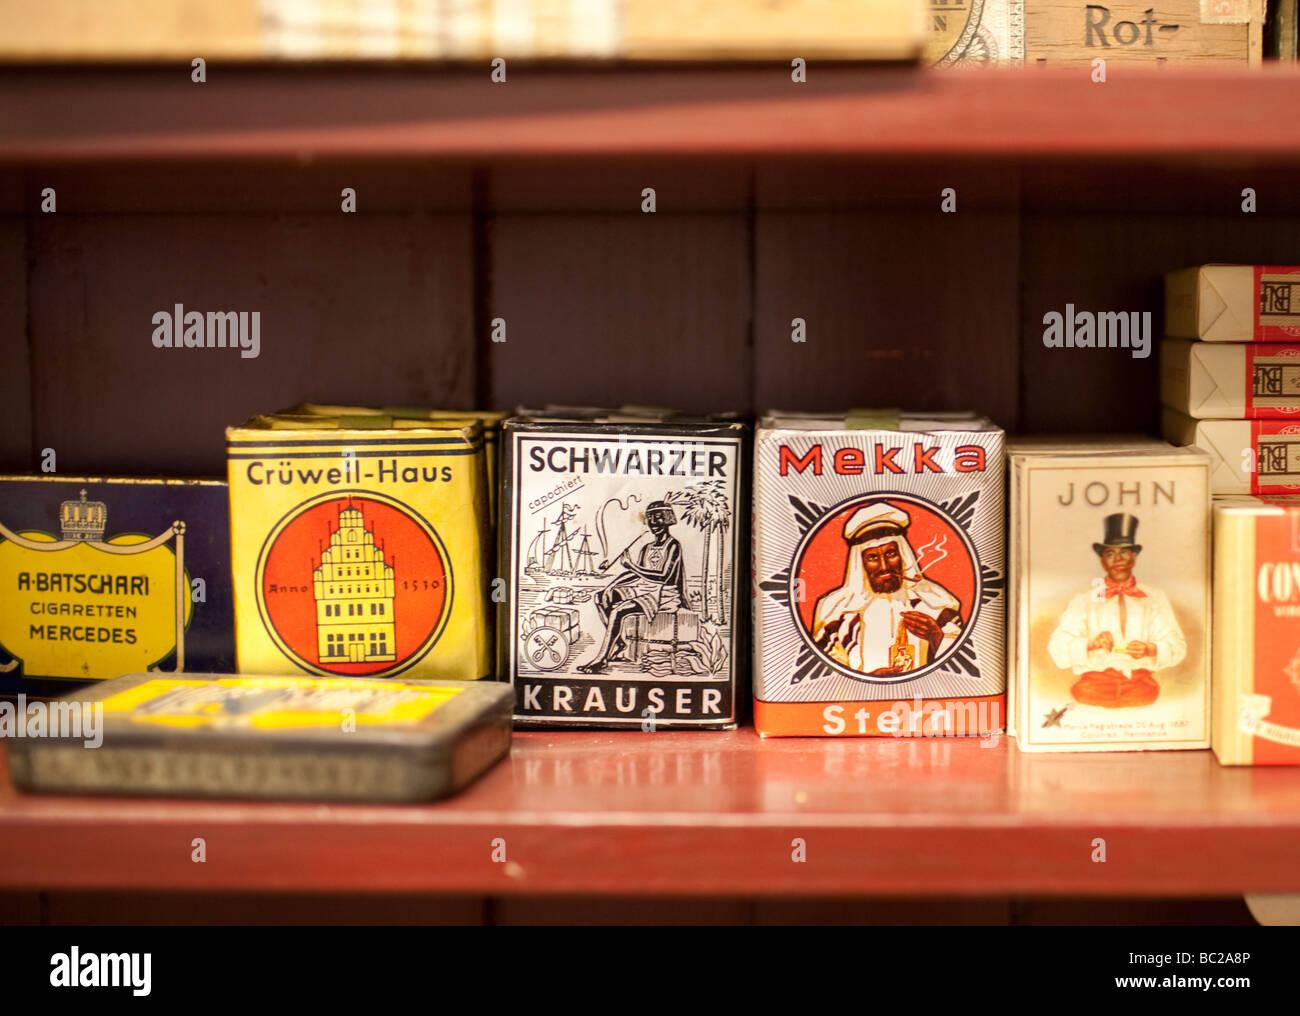 Cigarett - Stock Image